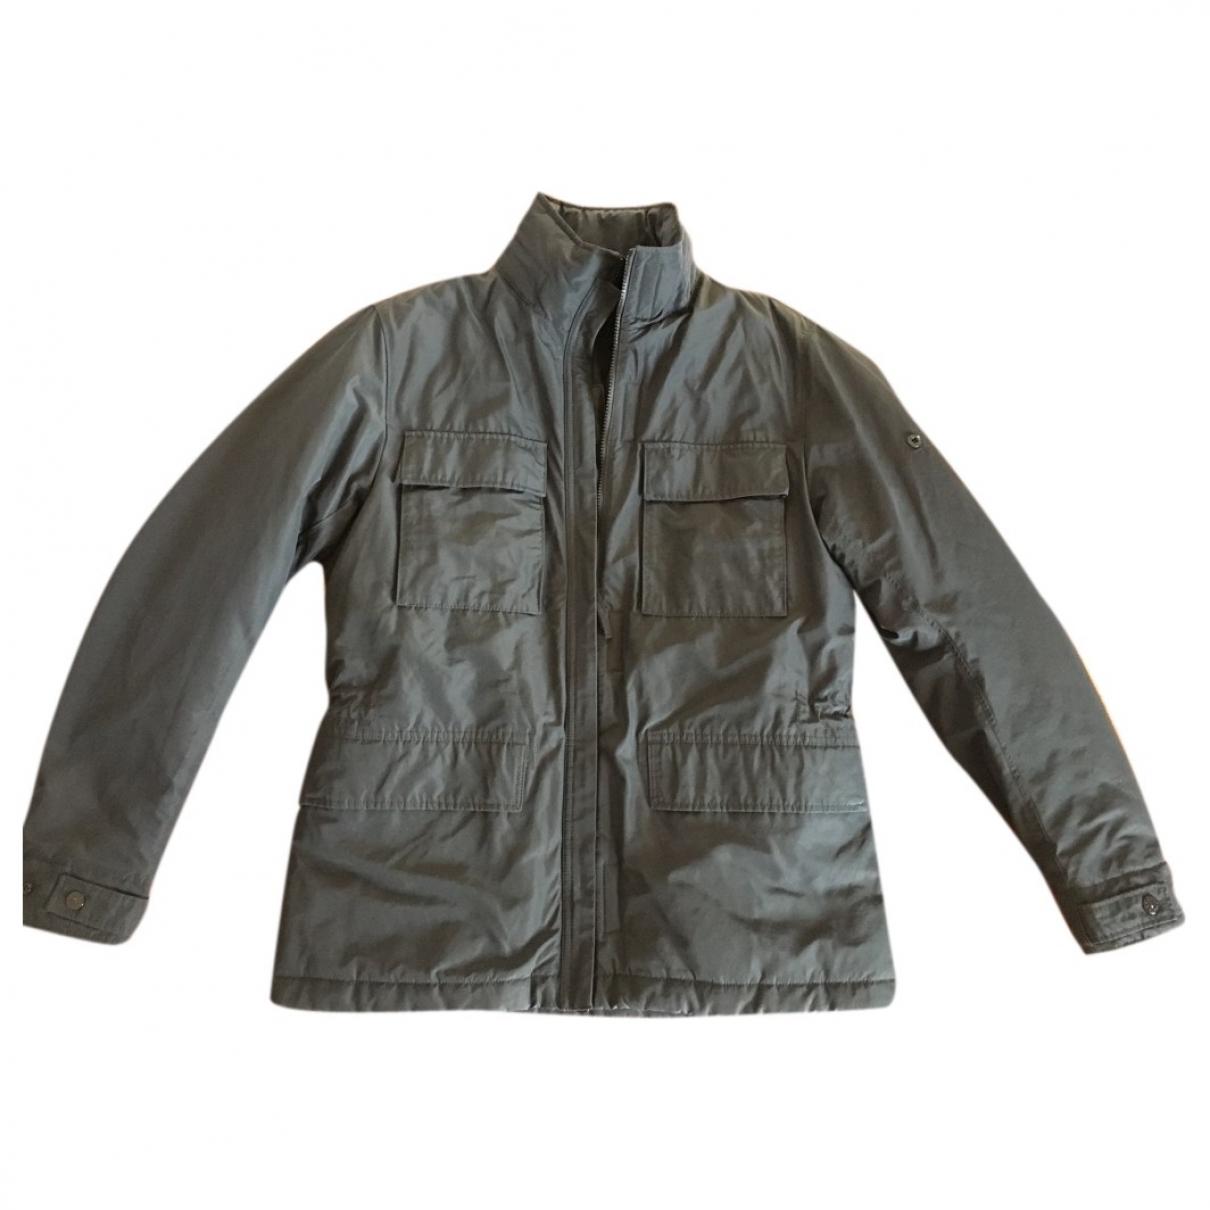 Stone Island \N Black jacket  for Men L International